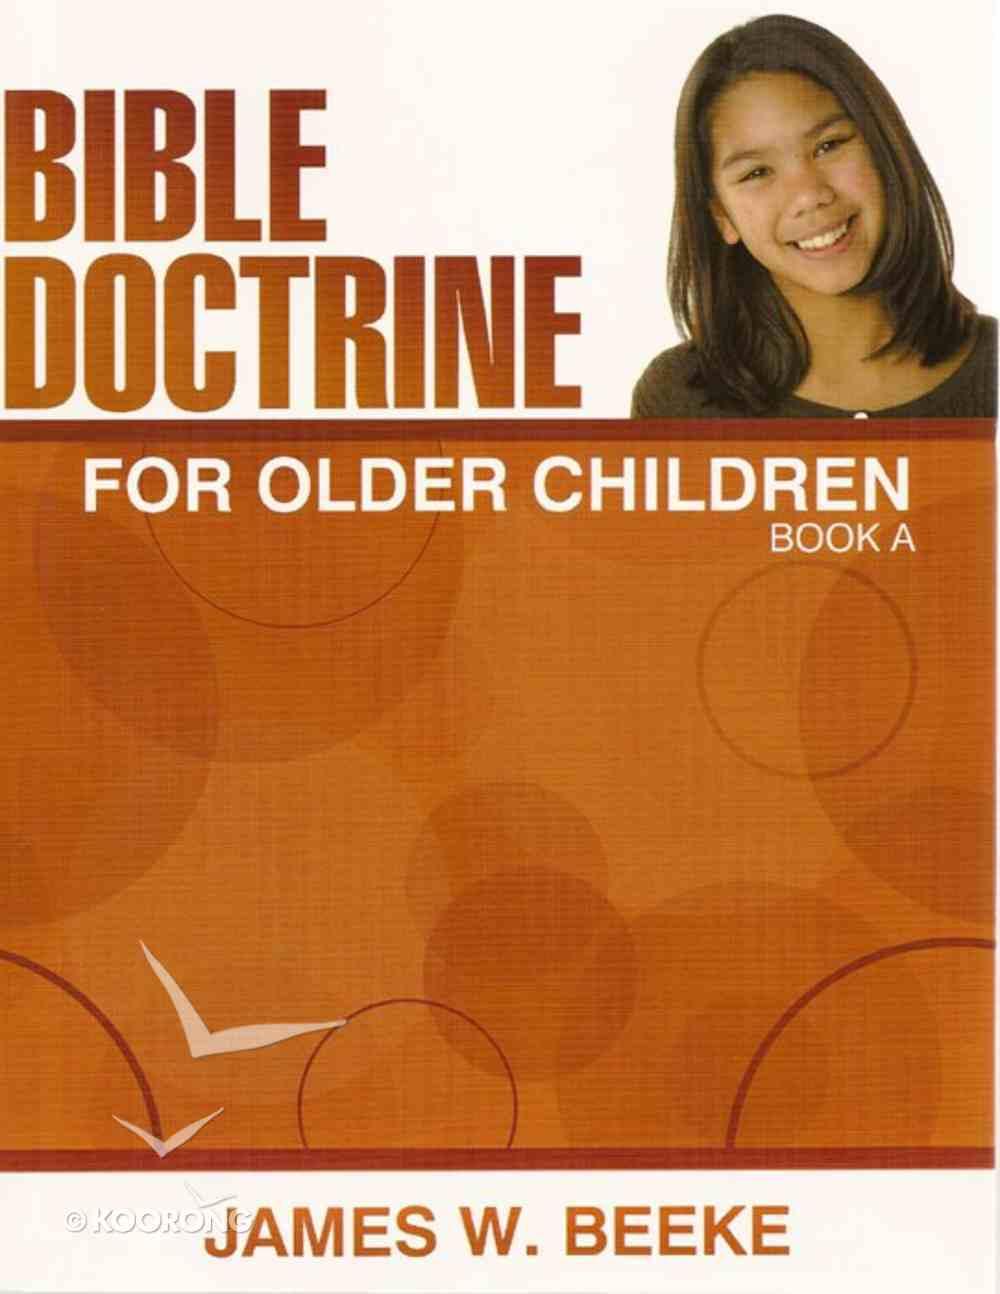 Bible Doctrine For Older Children (Ages 11+) (Book A, 1-10) Paperback